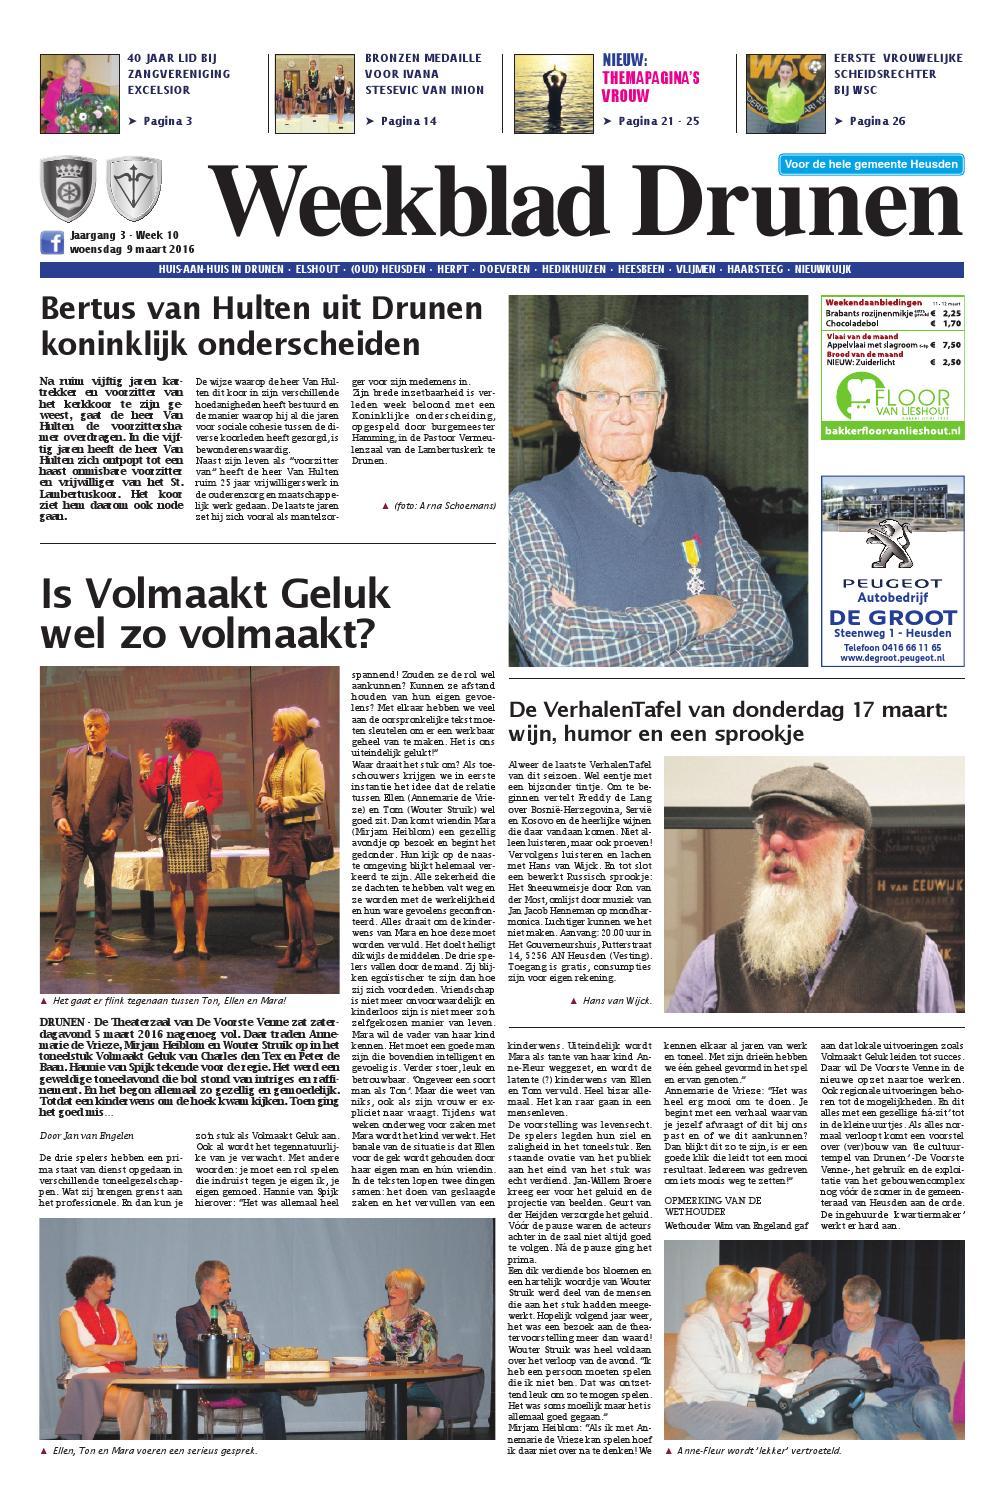 Weekblad Drunen 09-03-2016 by Uitgeverij Em de Jong - issuu a287091009b2